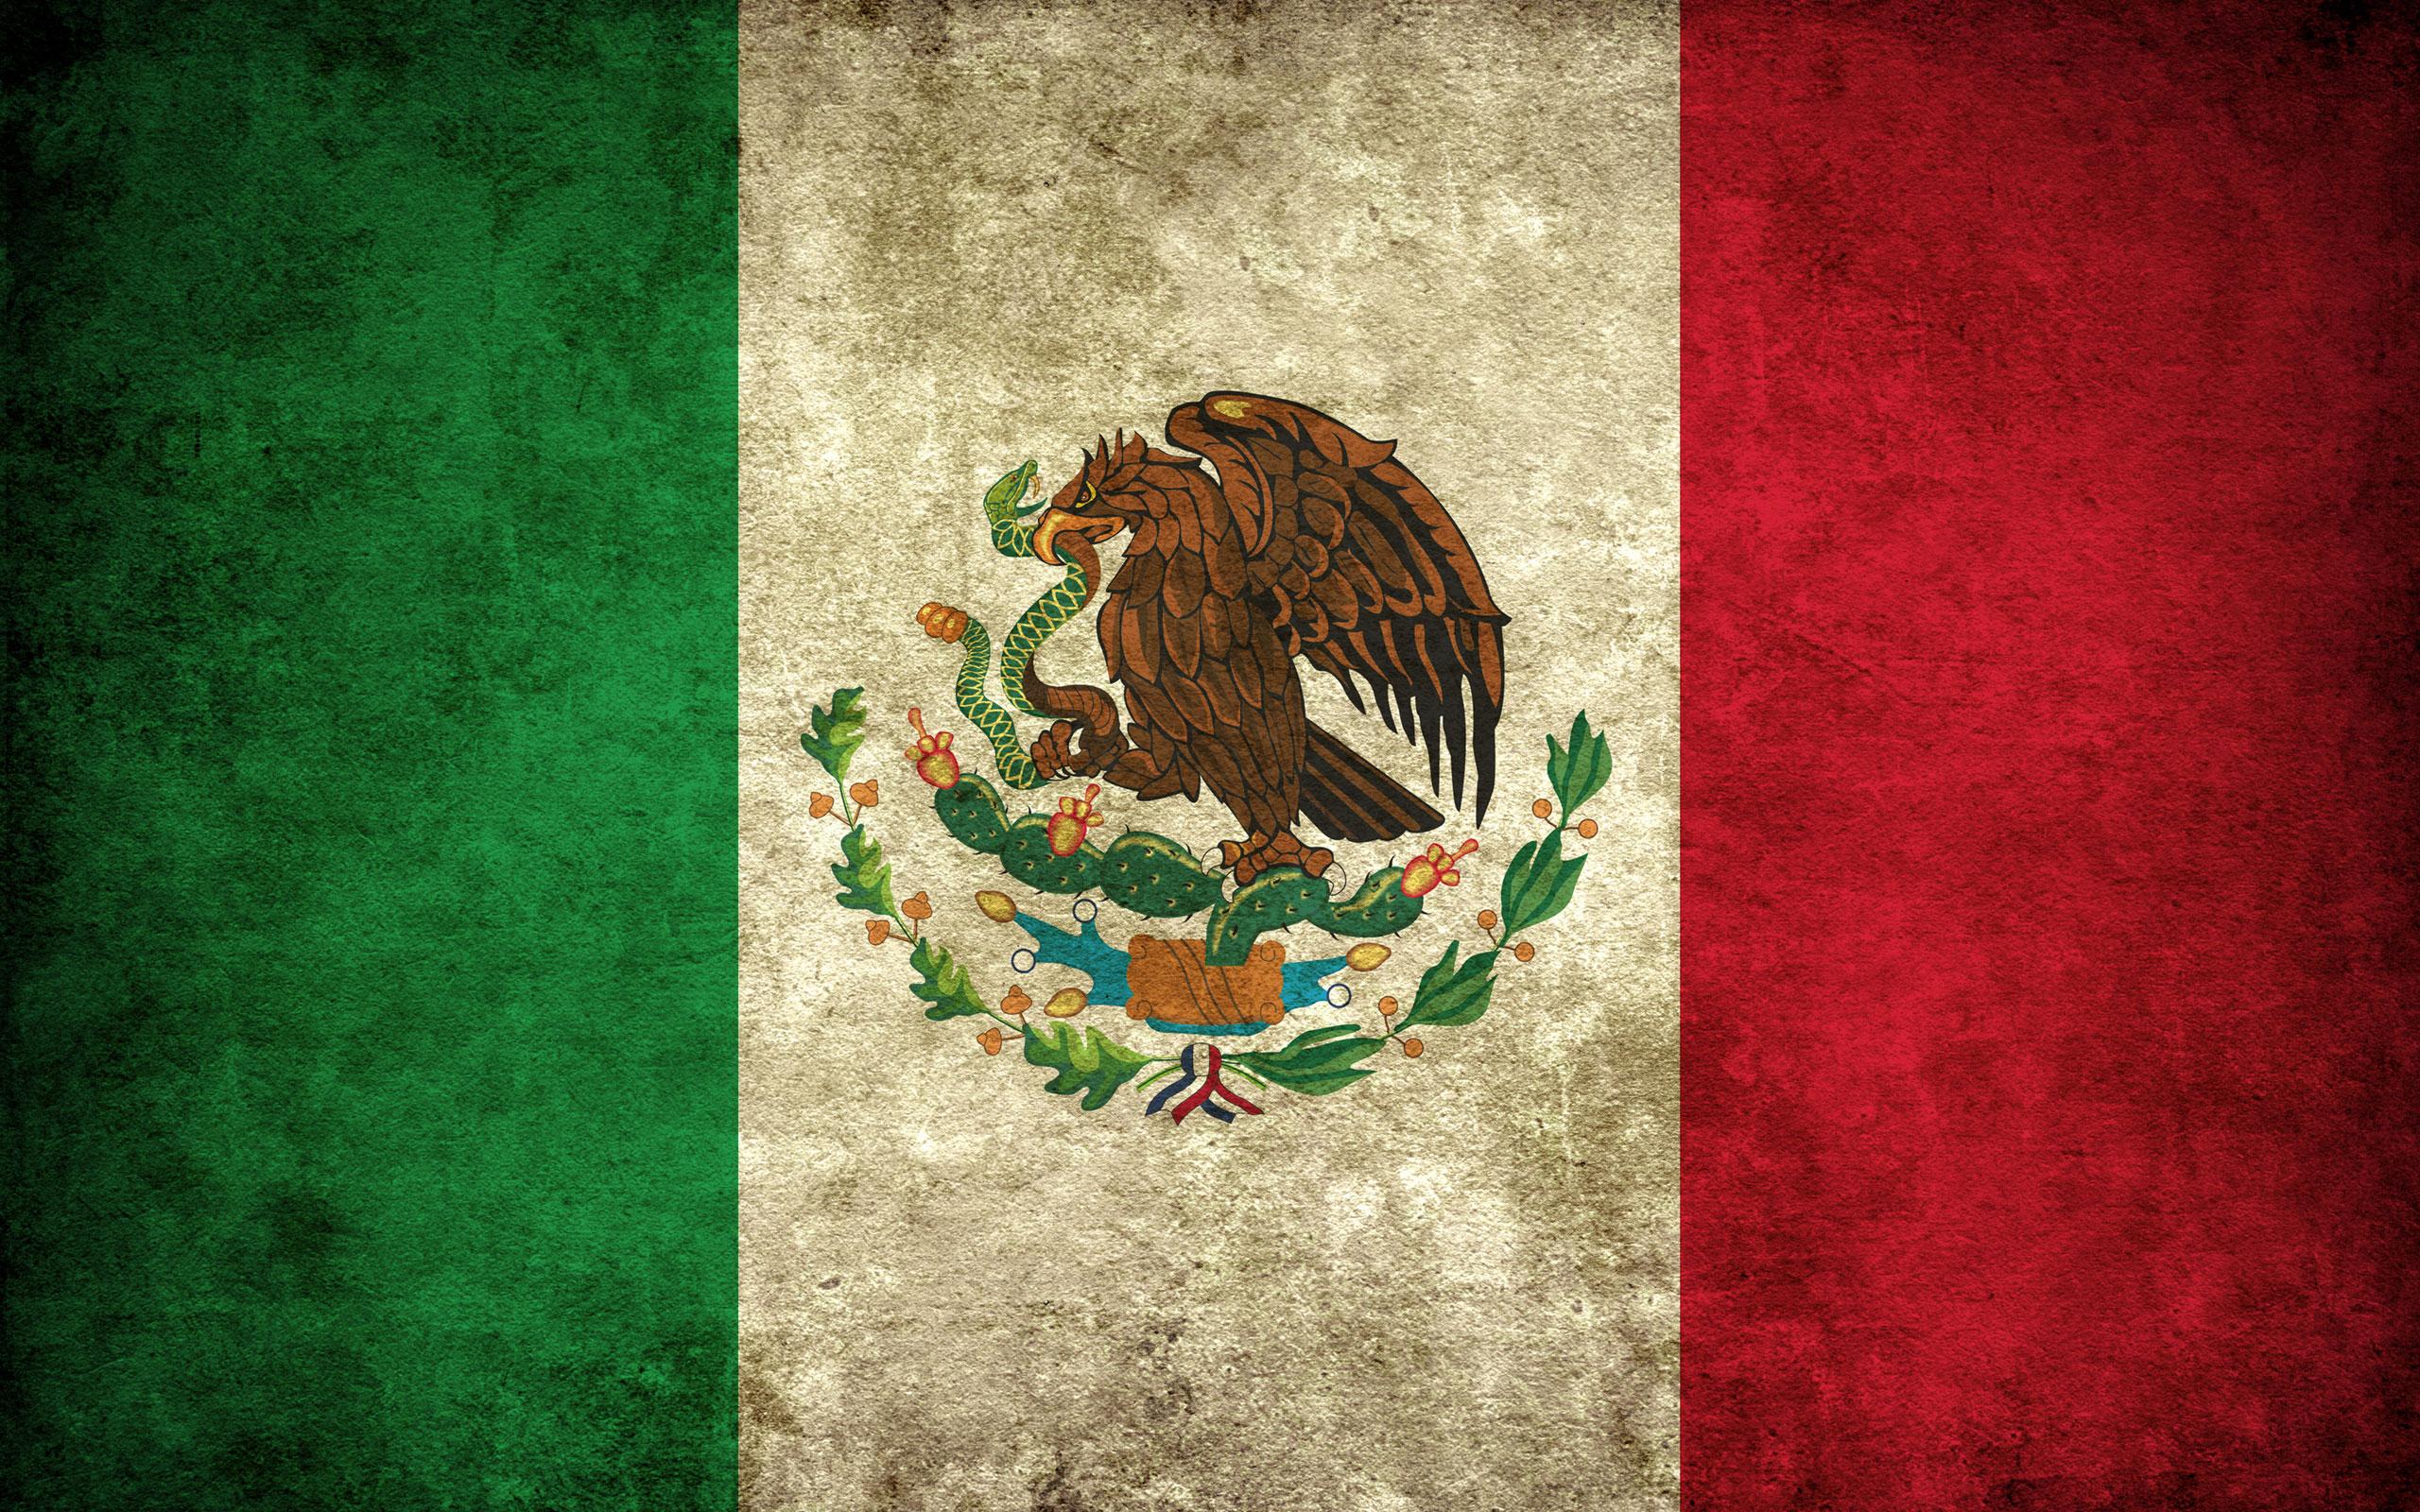 Fall Bird Wallpaper Free Photo Mexico Grunge Flag Aged Retro Nation